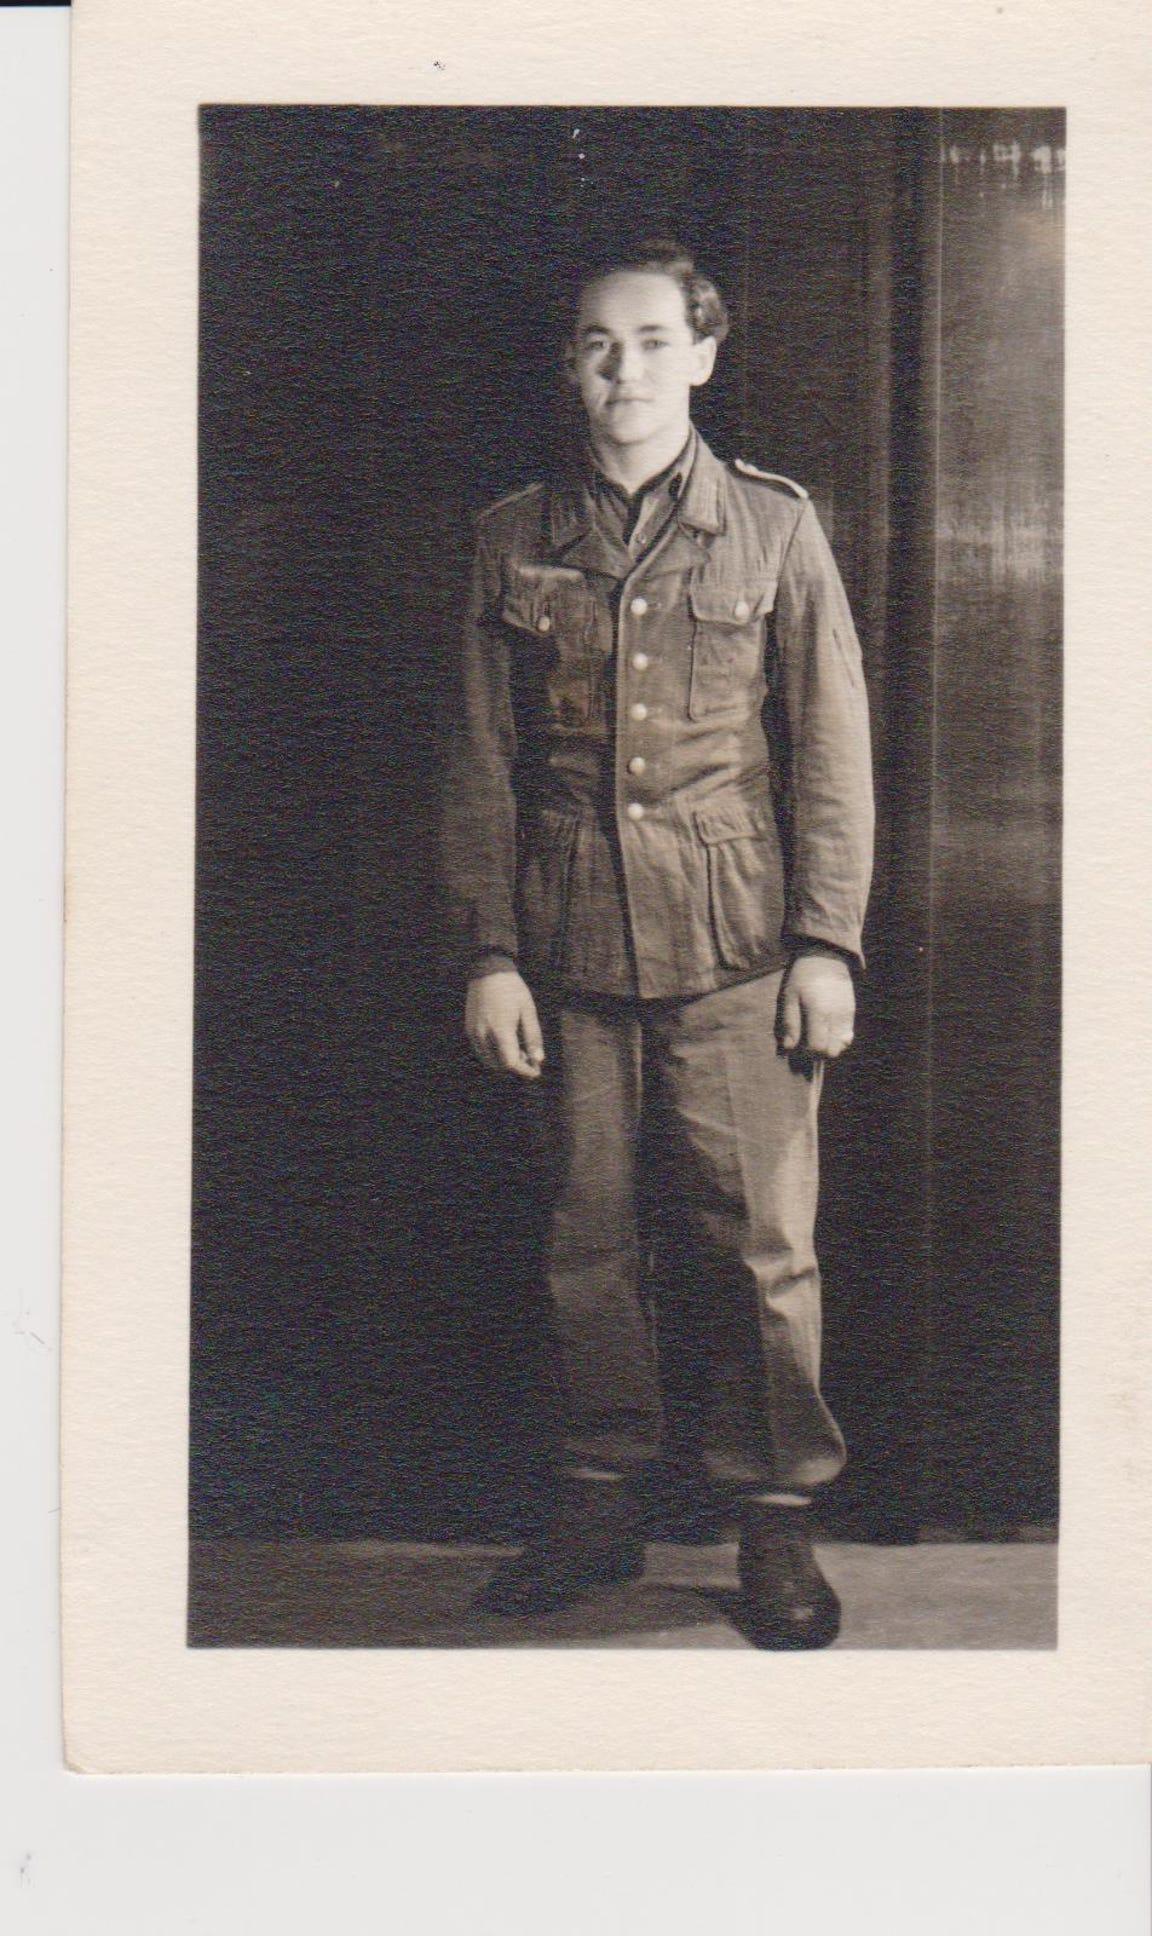 A photo of Kurt Pechmann when he was a German POW in Camp Hartford in 1945.